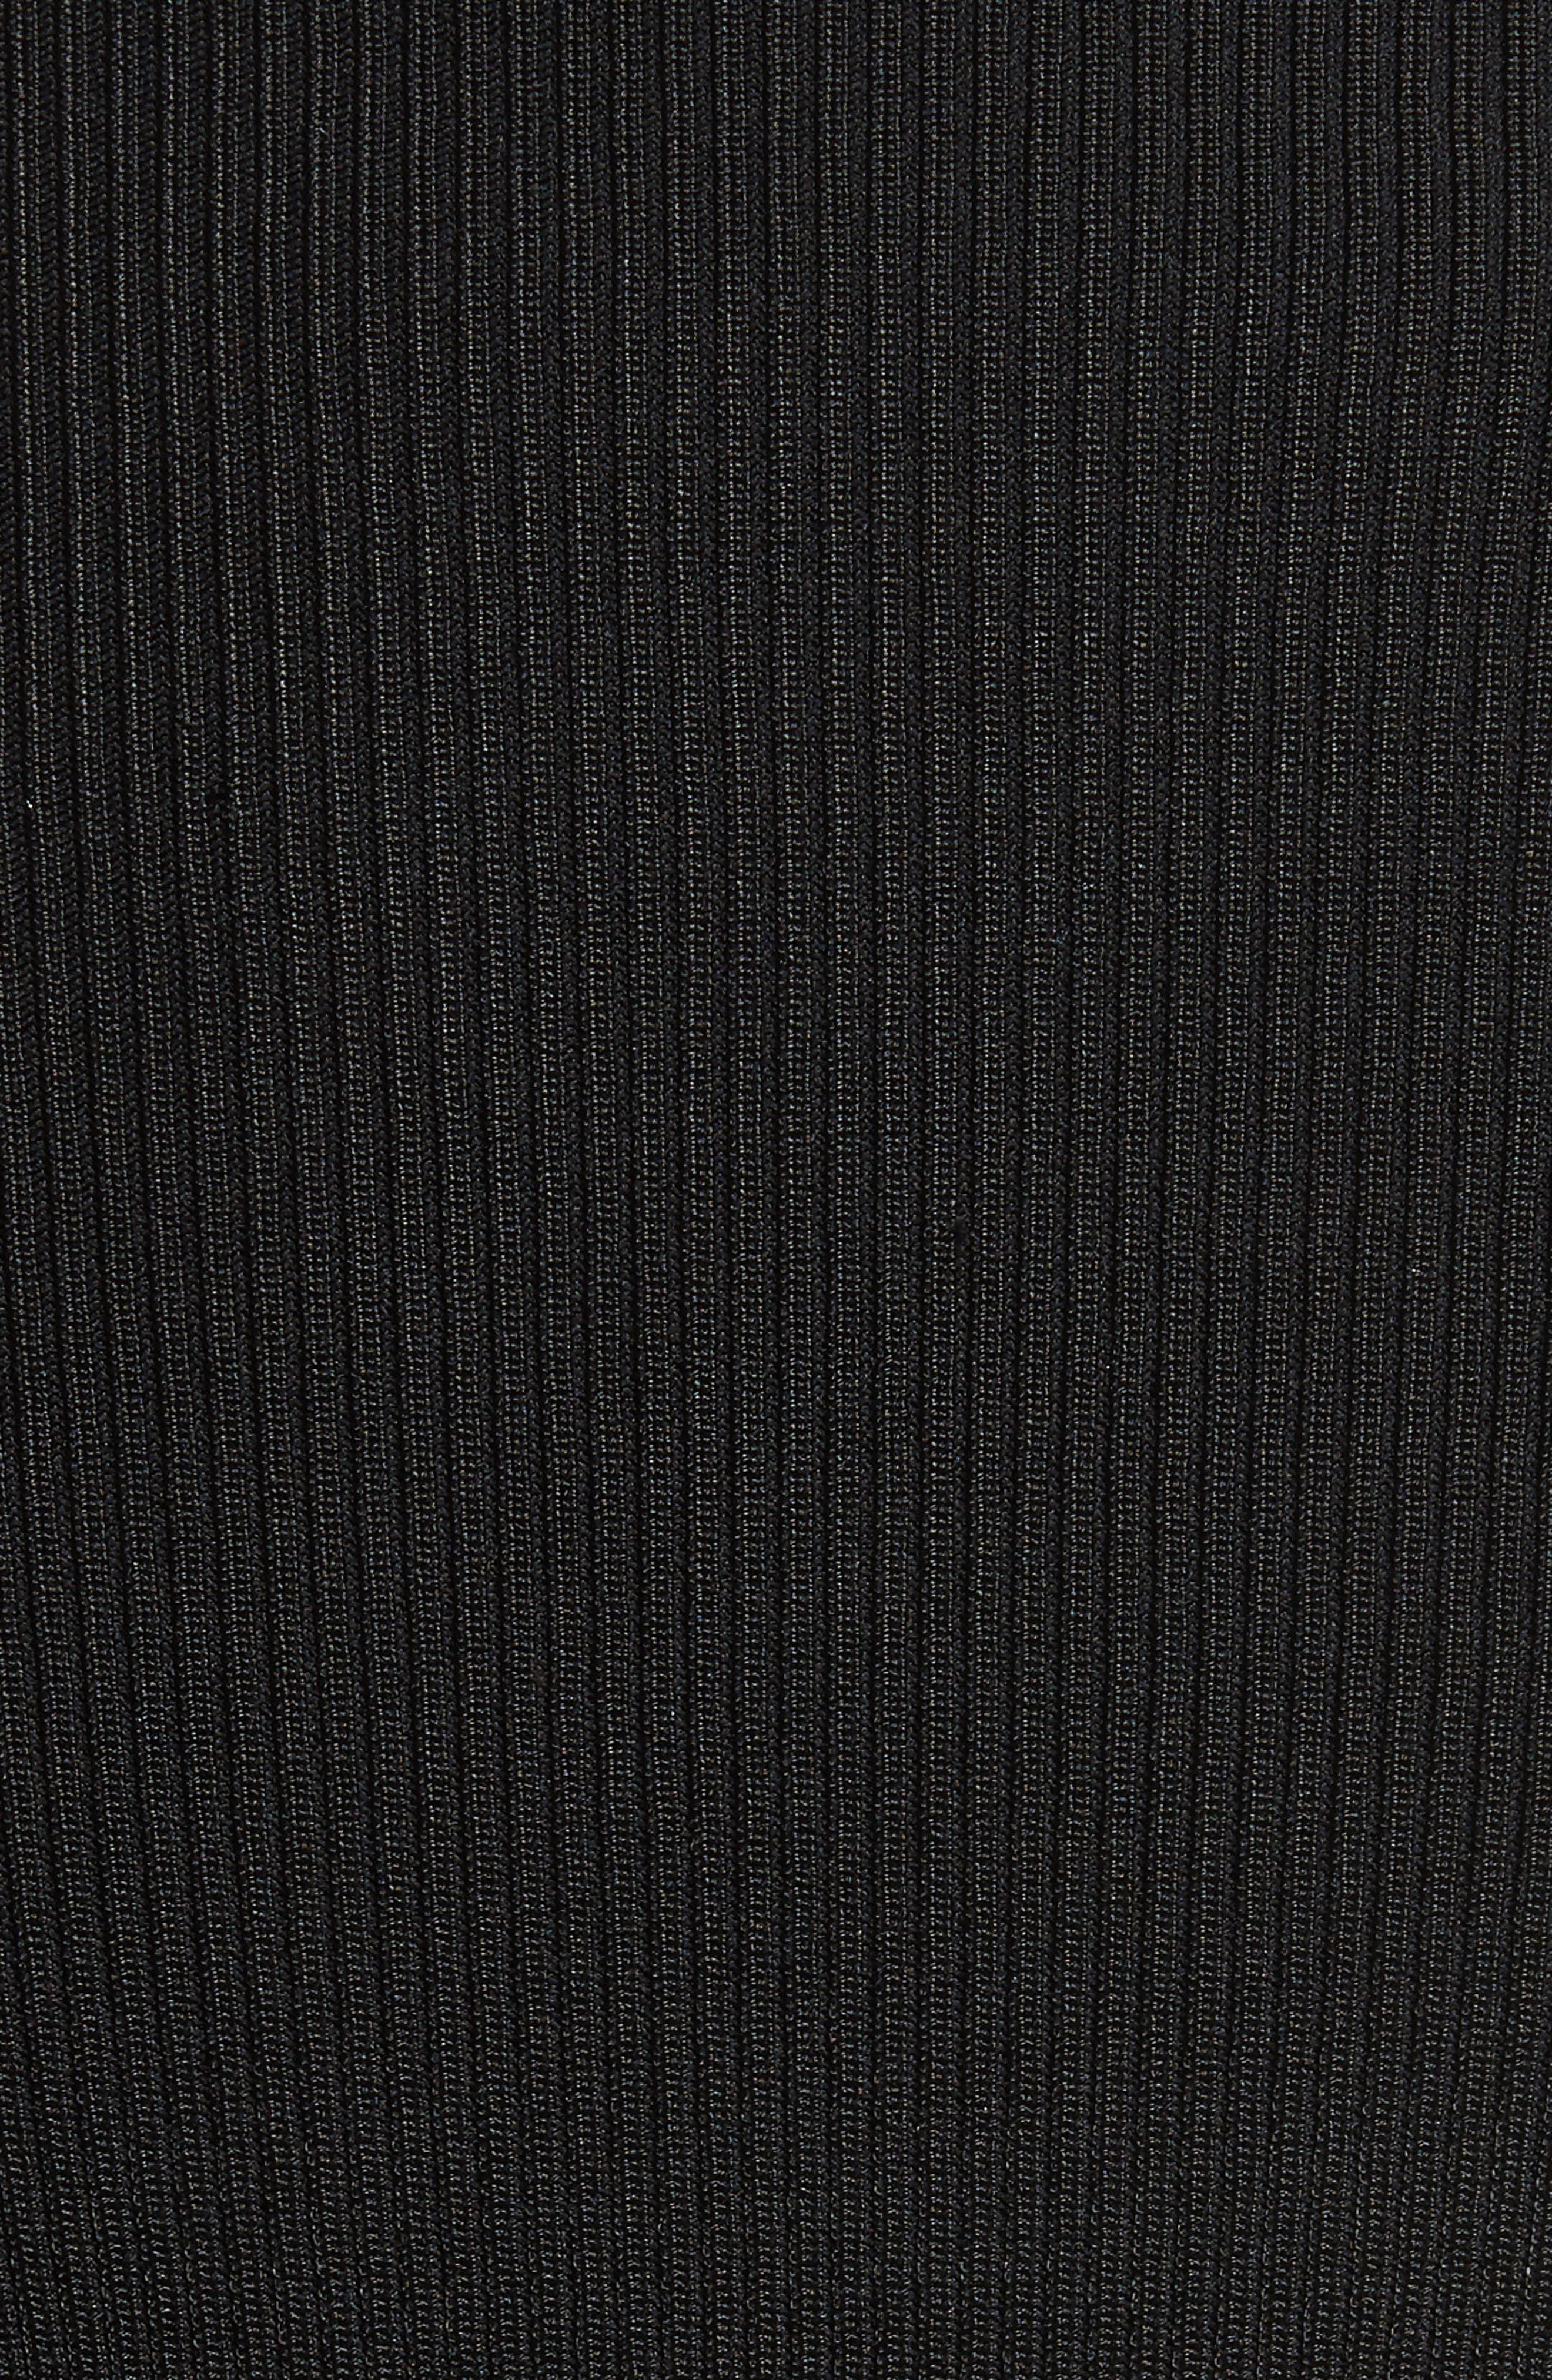 Desiree Cutout Ribbed Body-Con Dress,                             Alternate thumbnail 5, color,                             001